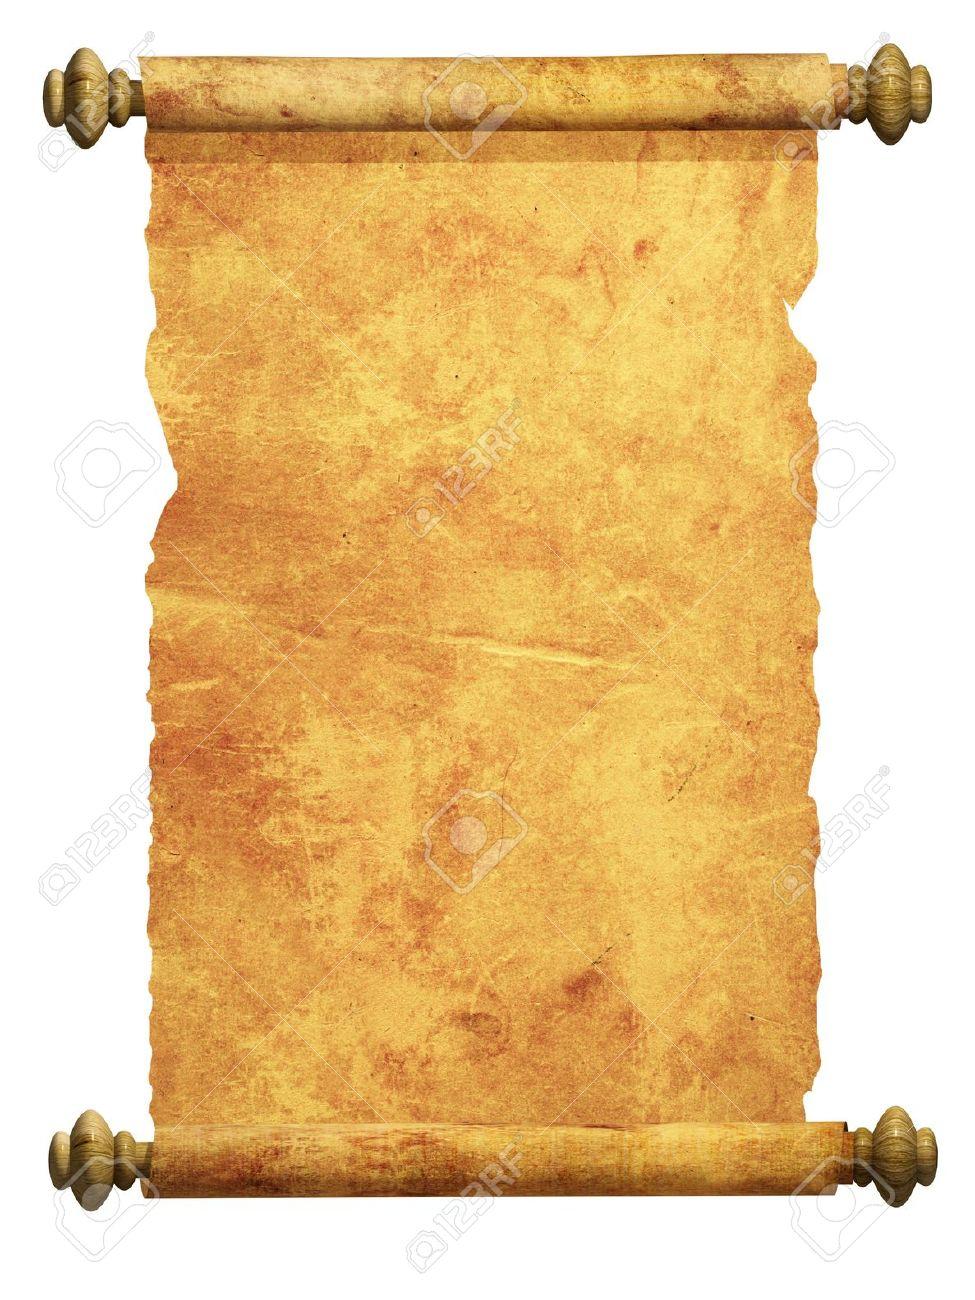 Drawn scroll papyrus #4 - Scroll PNG HD